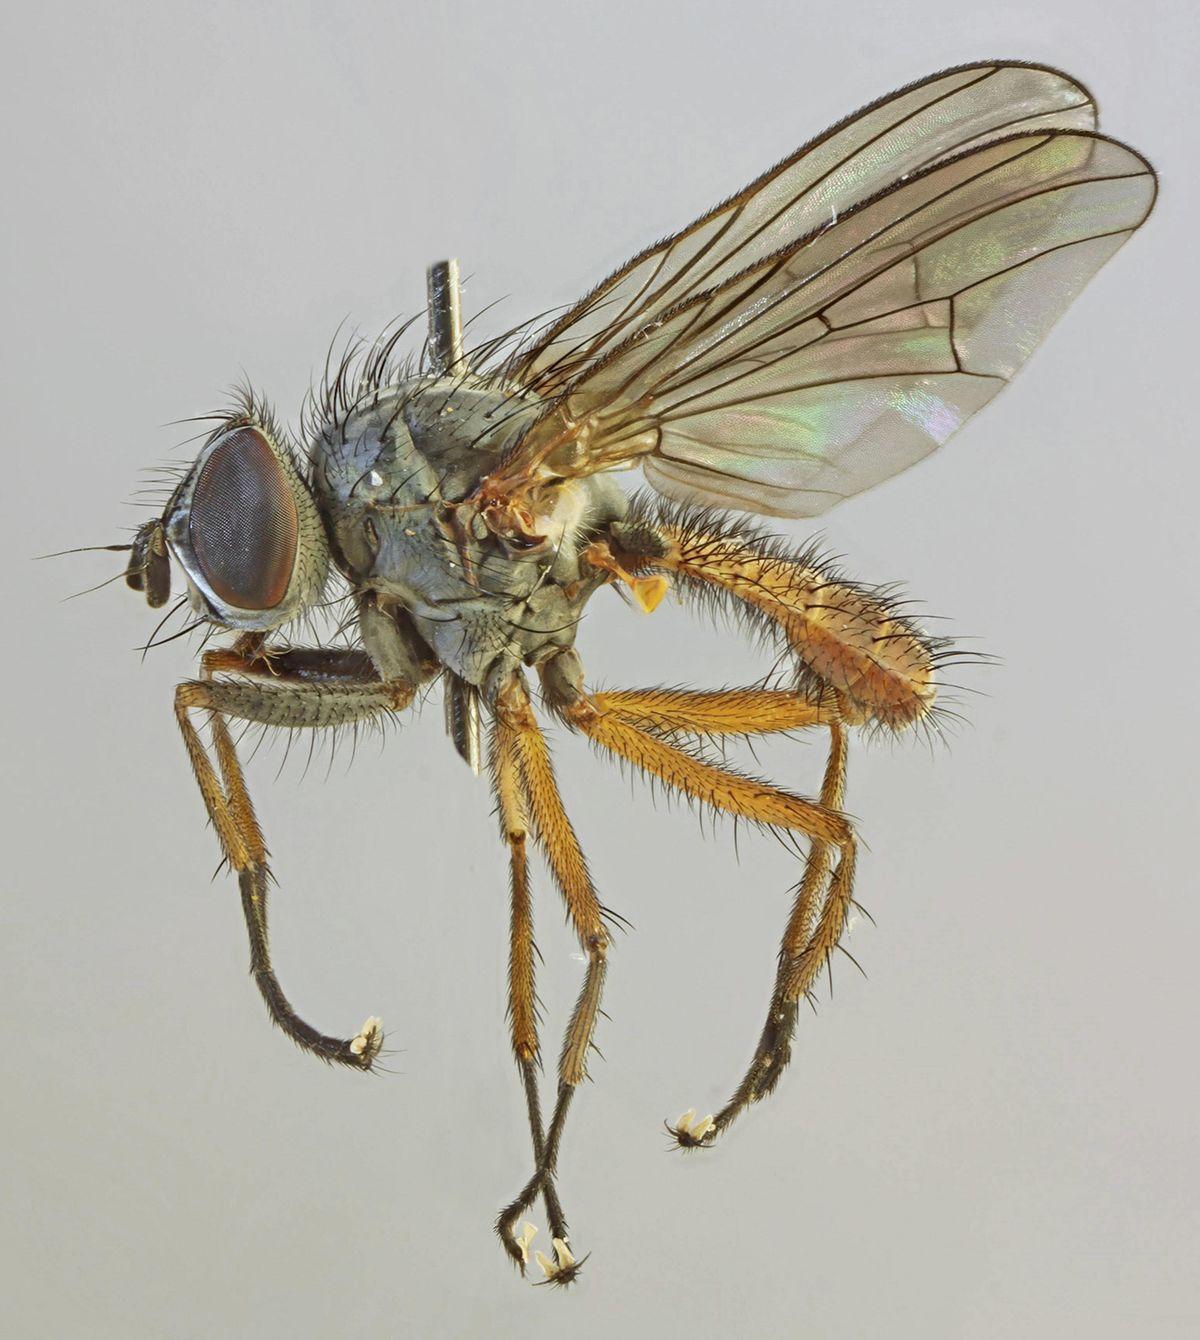 Anthomyiidae - Wikispecies